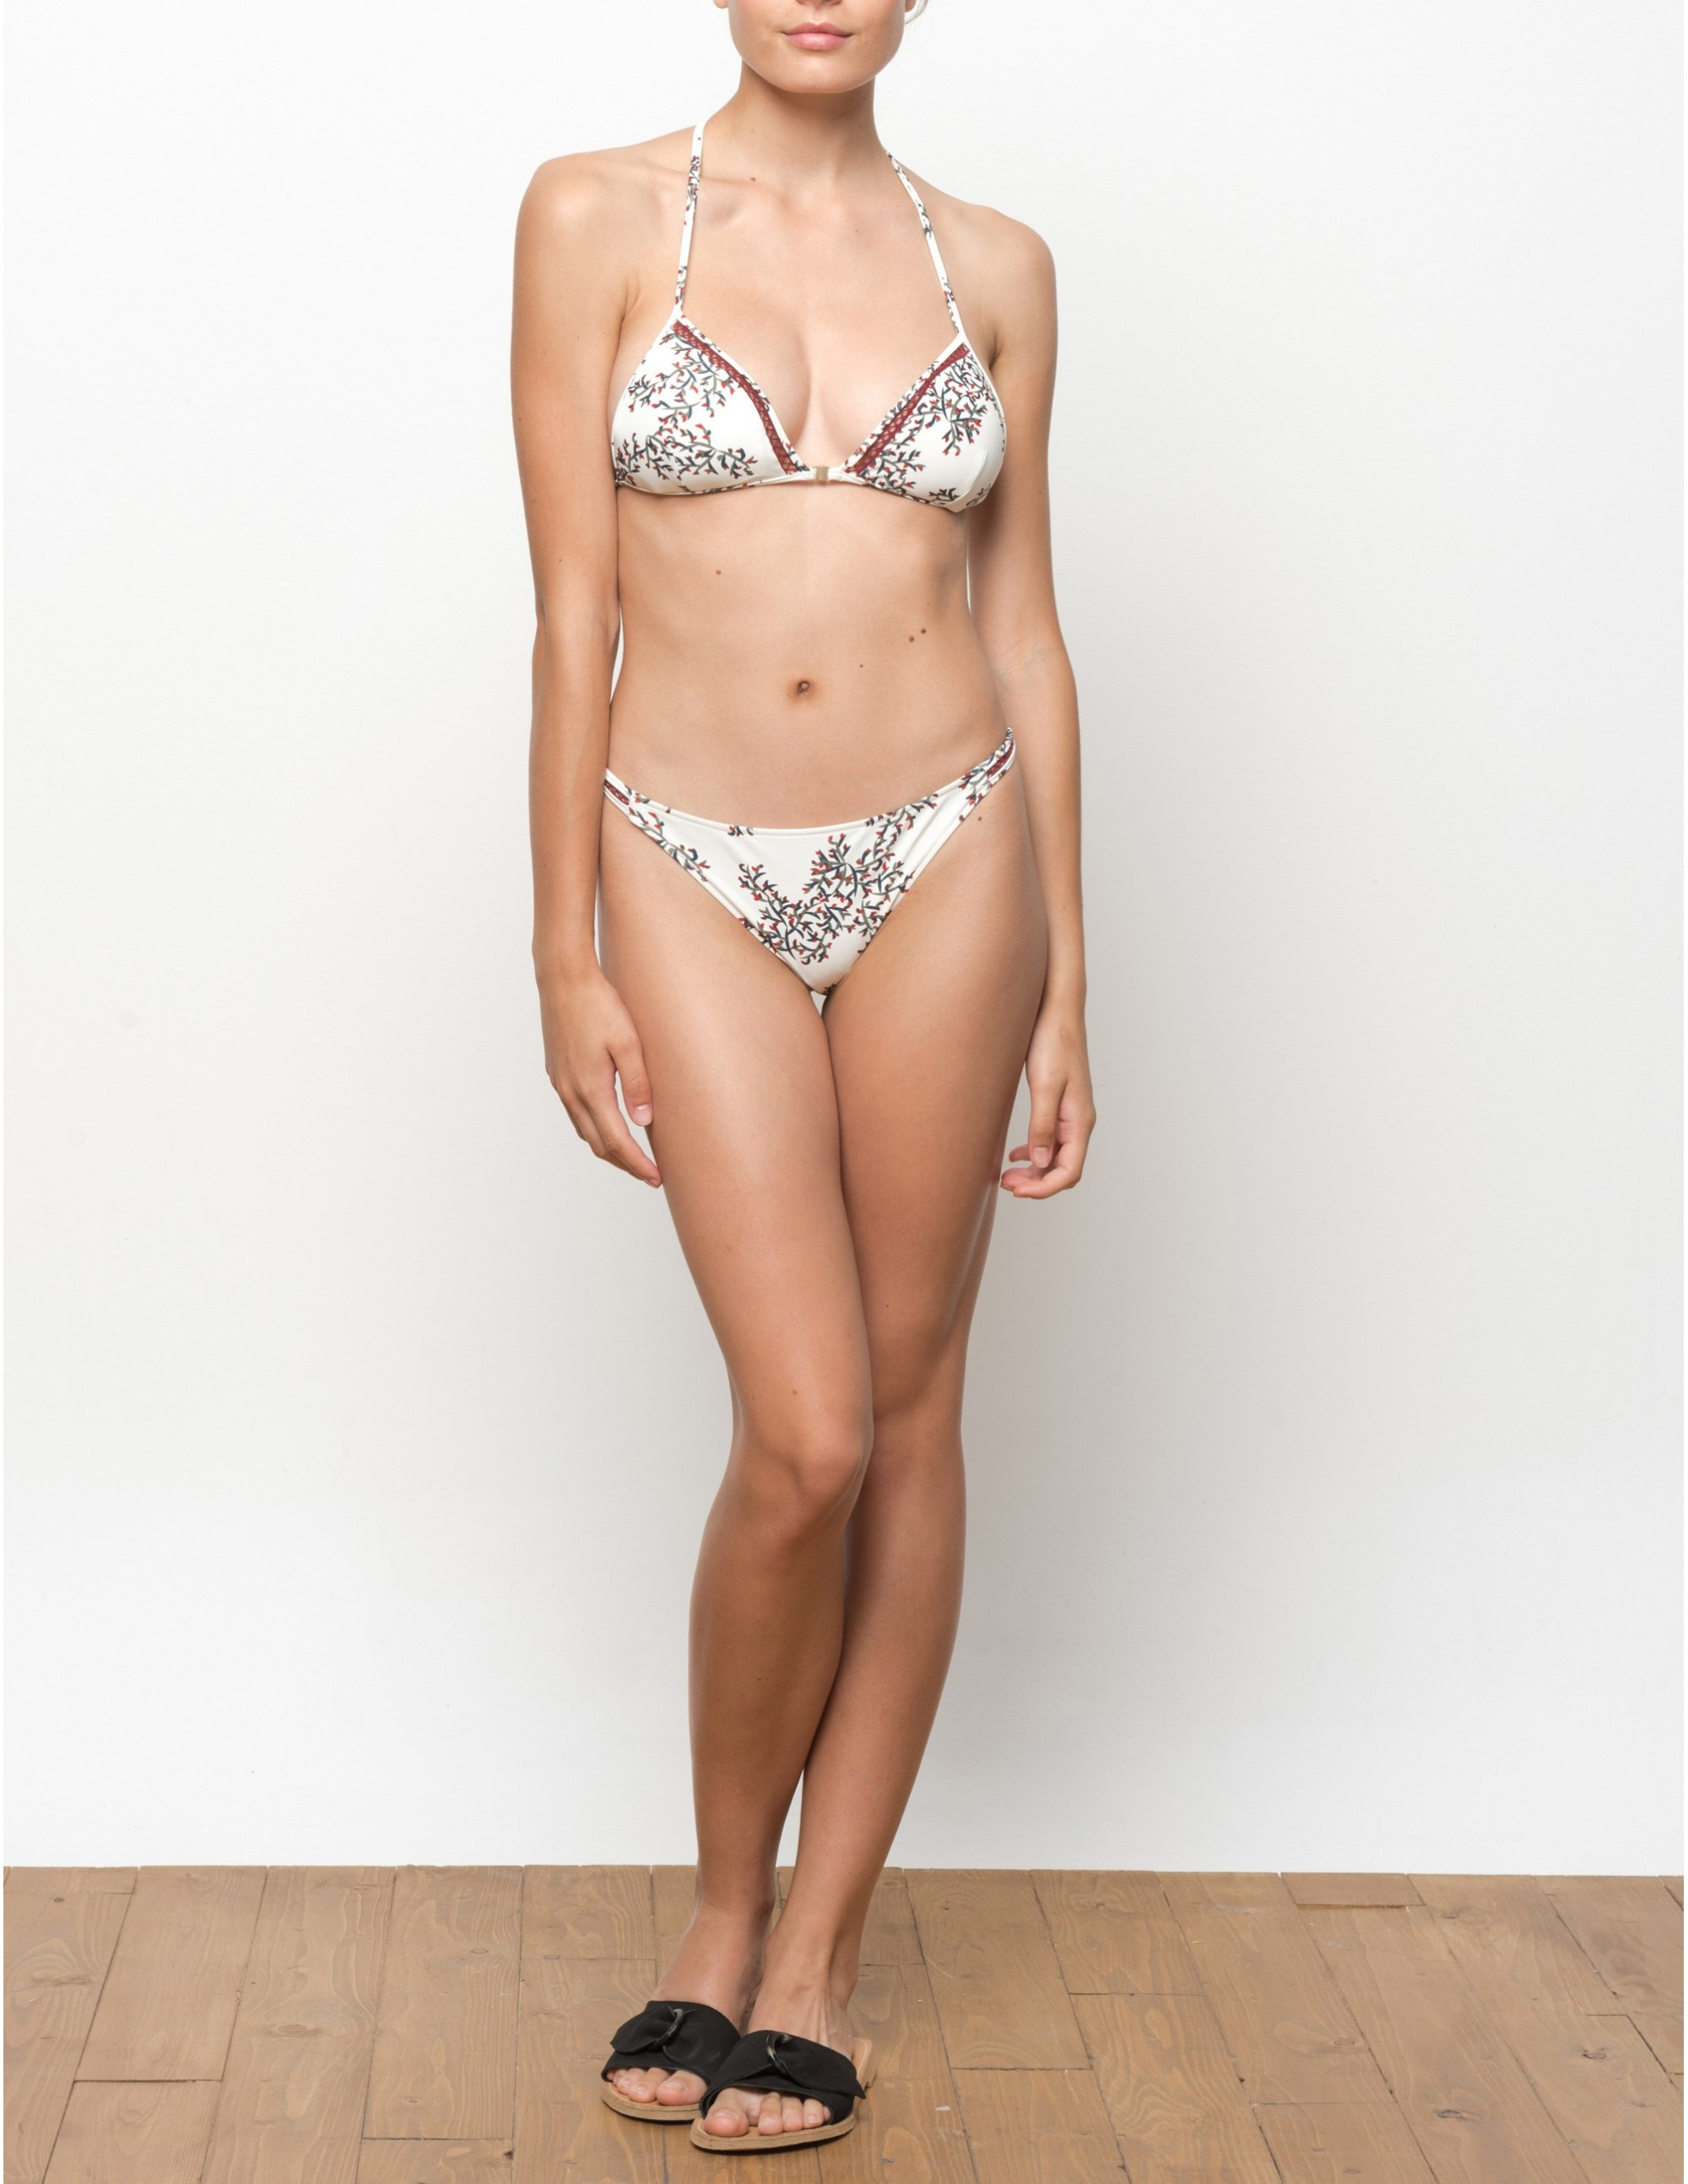 ANAMUR bikini top - ACACIA